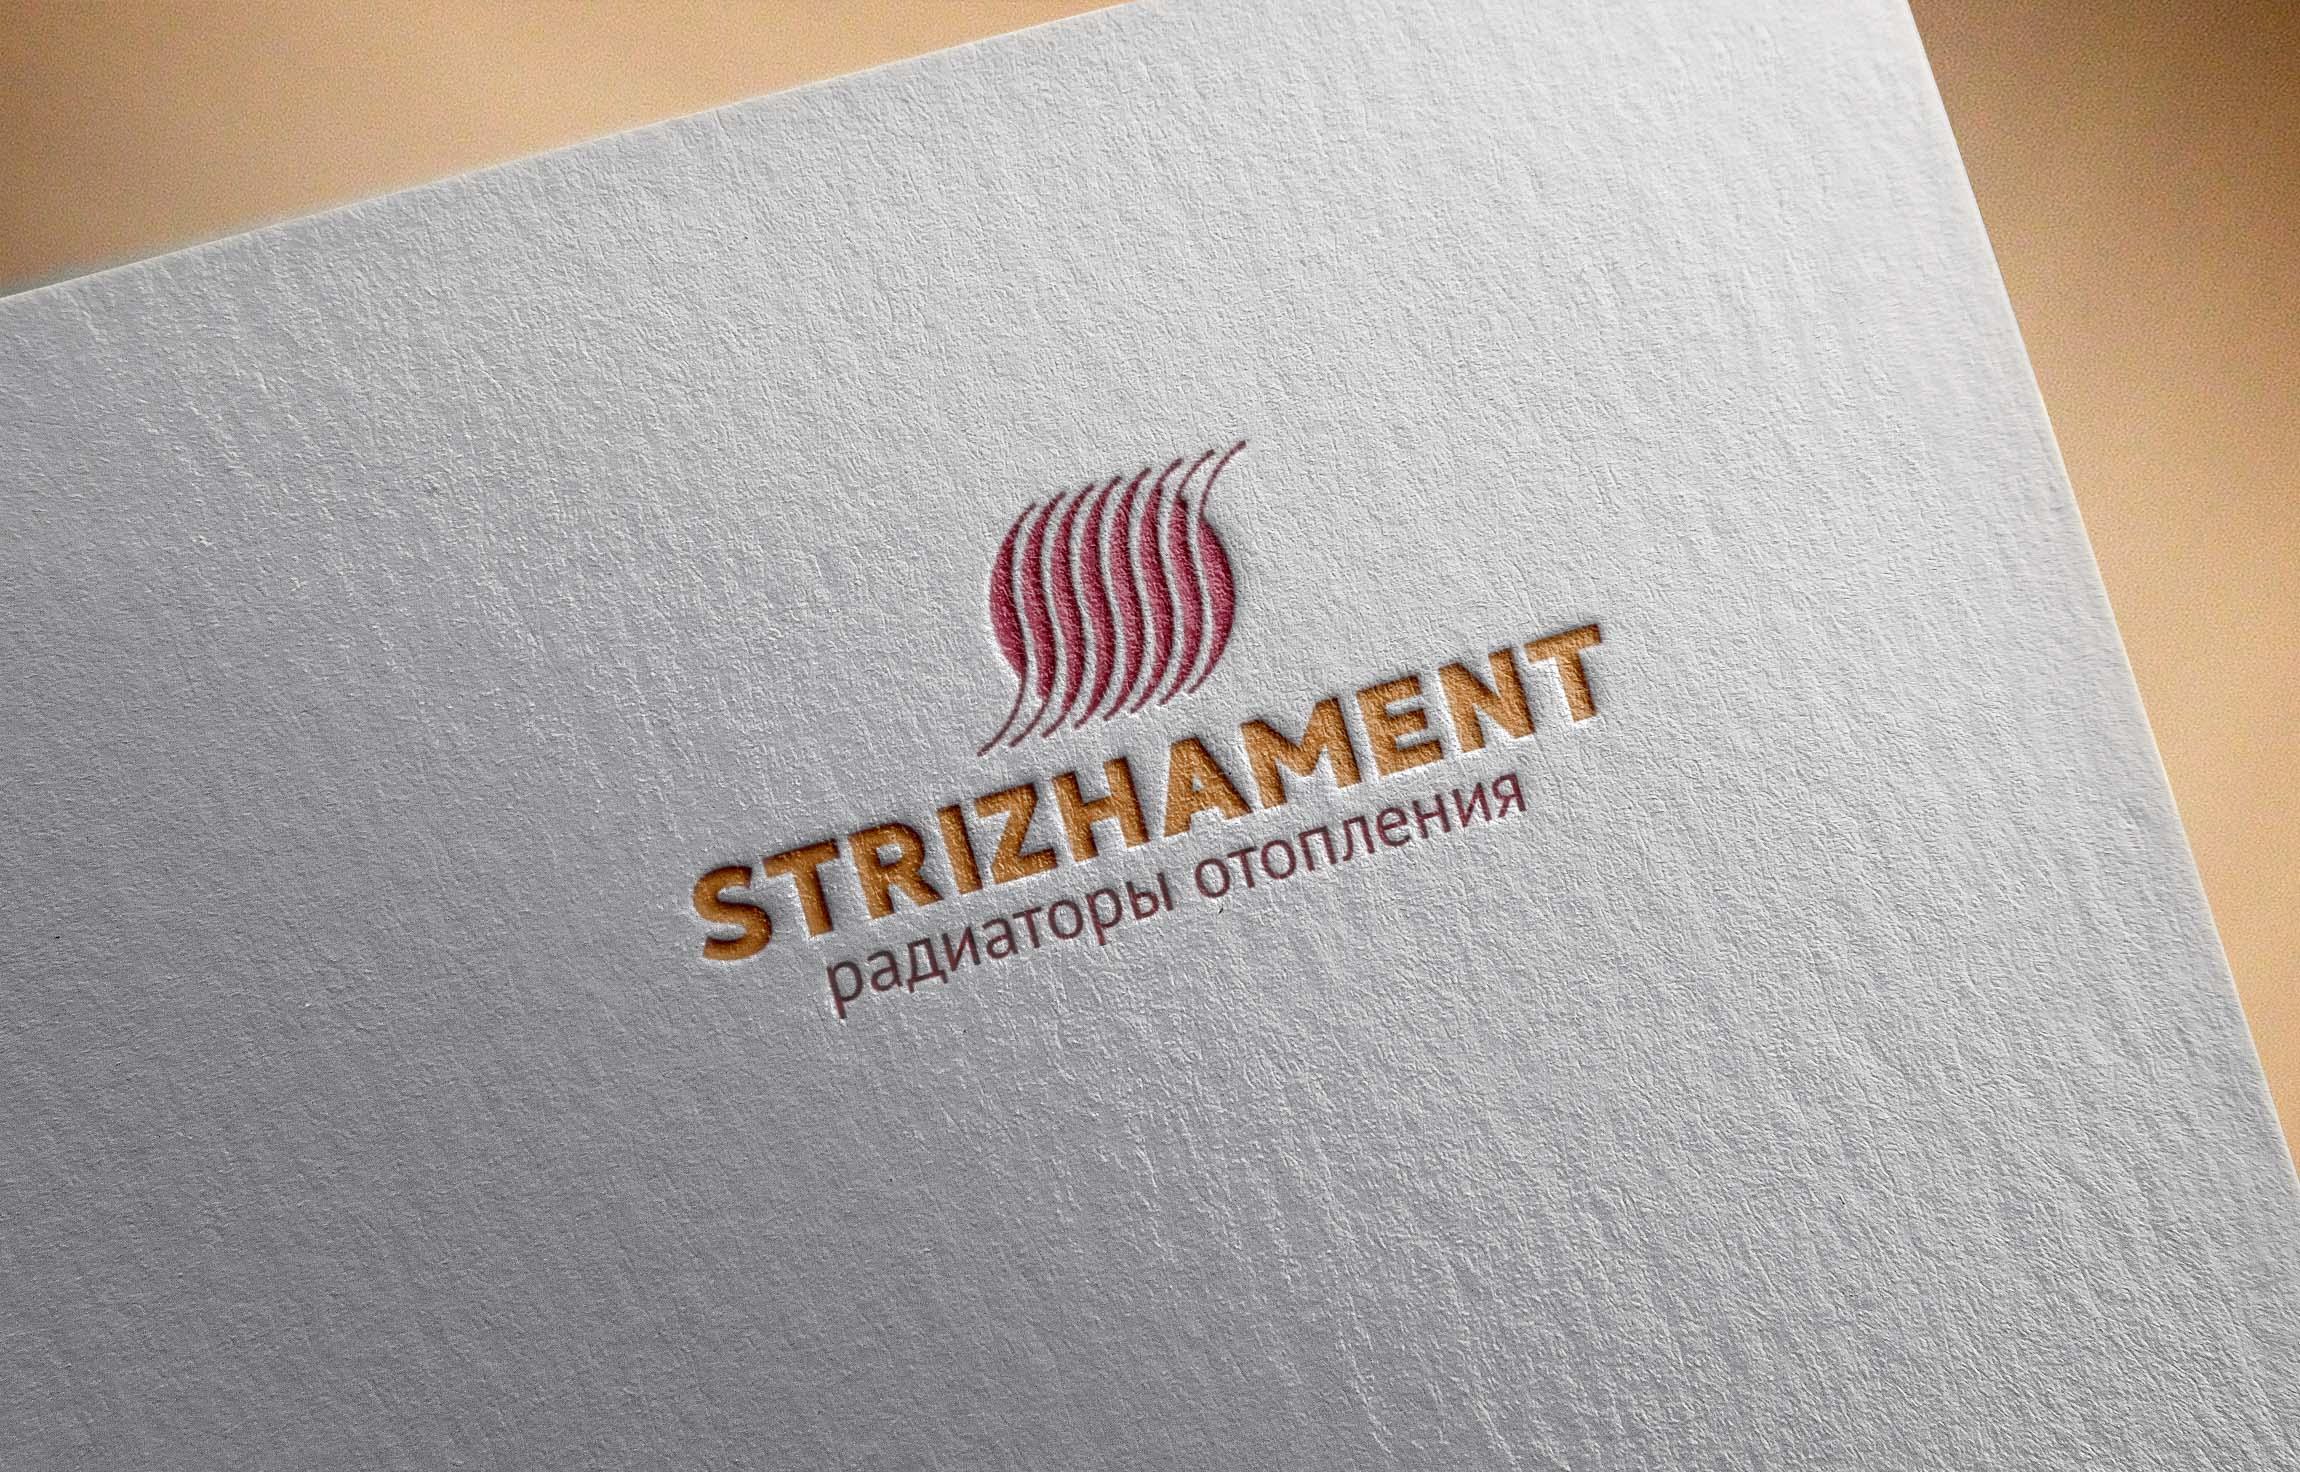 Дизайн лого бренда фото f_0315d5132473efdd.jpg